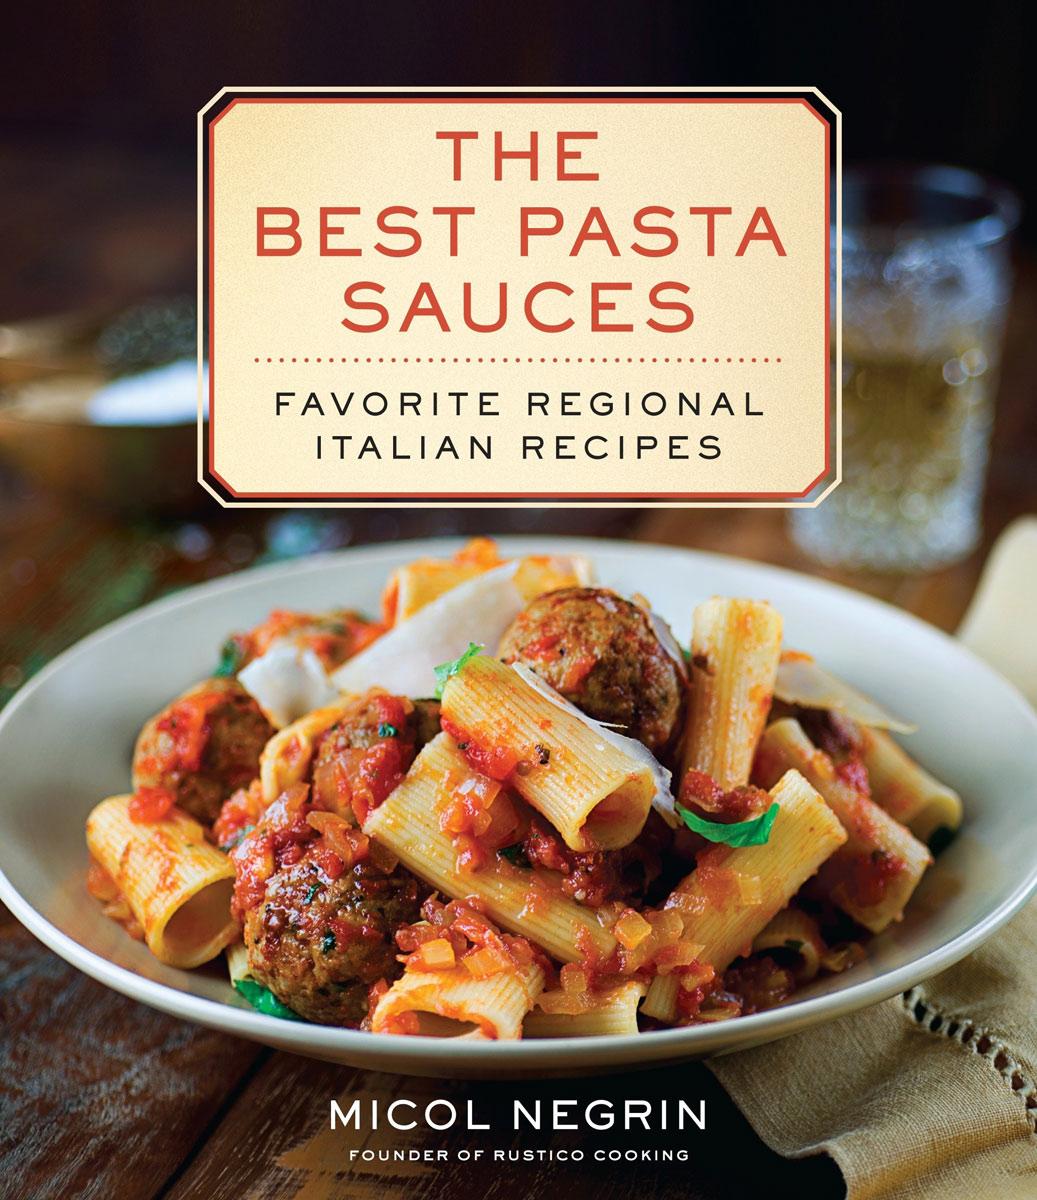 Rustico Cooking Micol Negrin Book